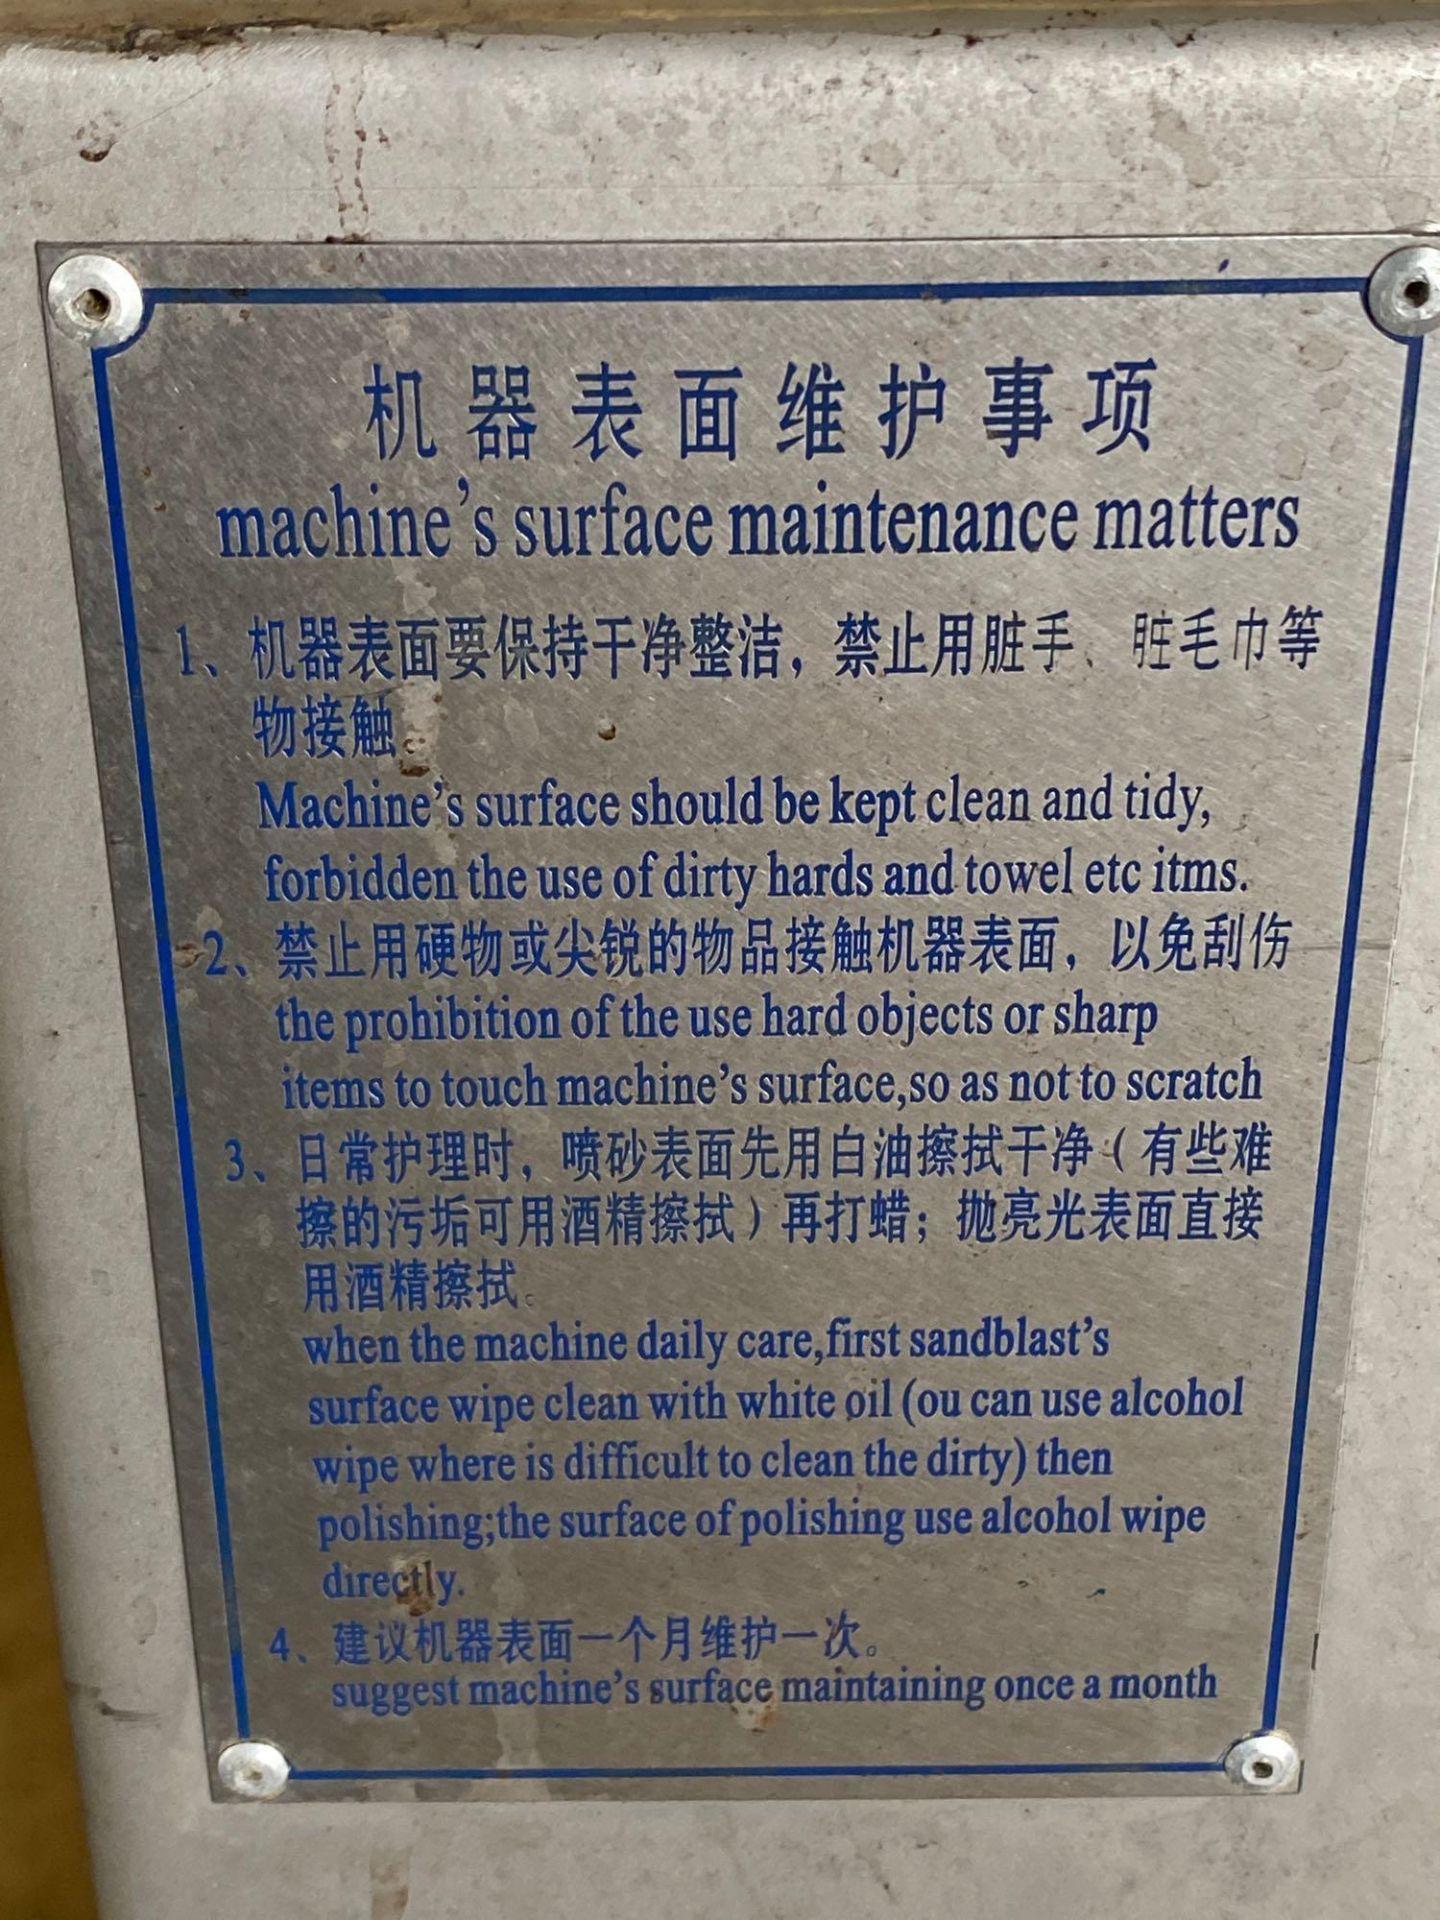 High Efficiency Intelligent Film Coating Machine/Pan Coater - Image 11 of 12